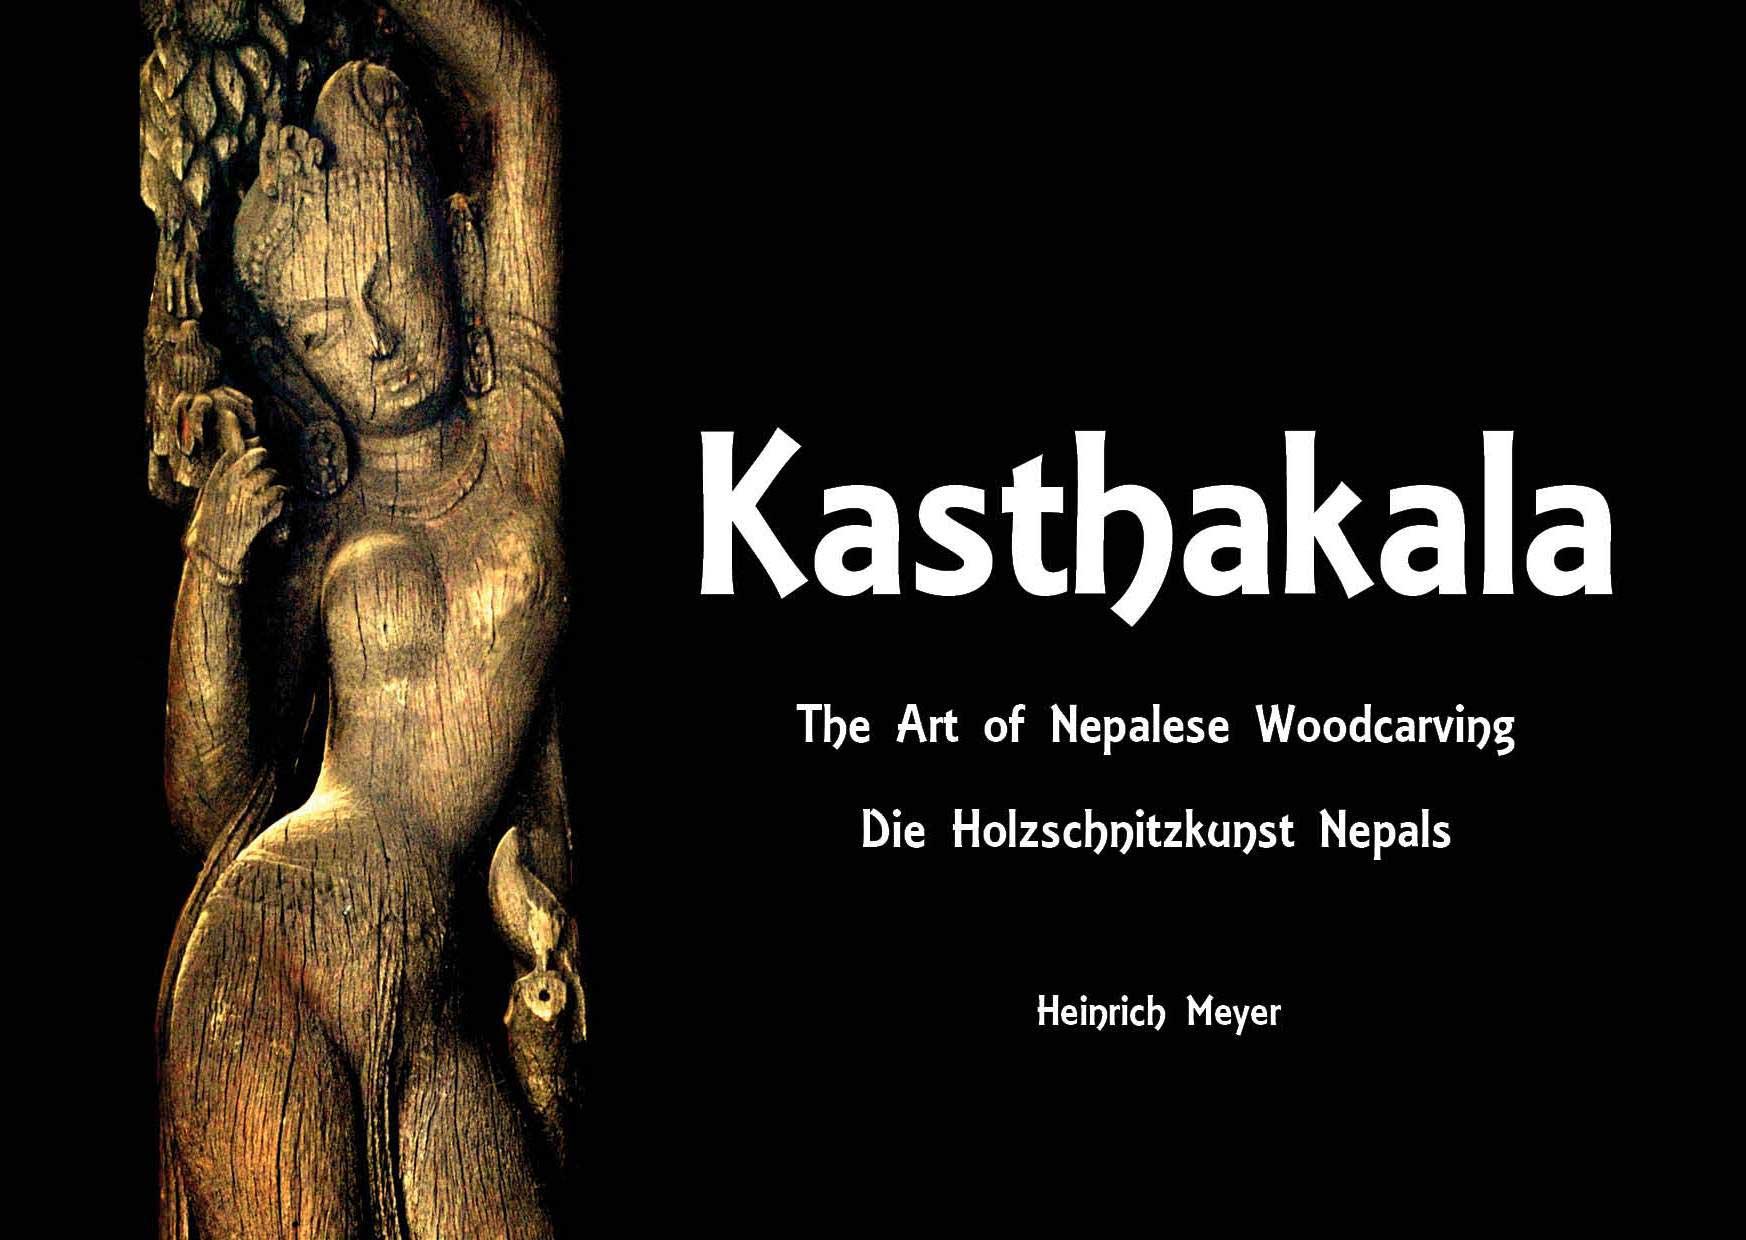 Kasthakala: The Art of Nepalese Woodcarving